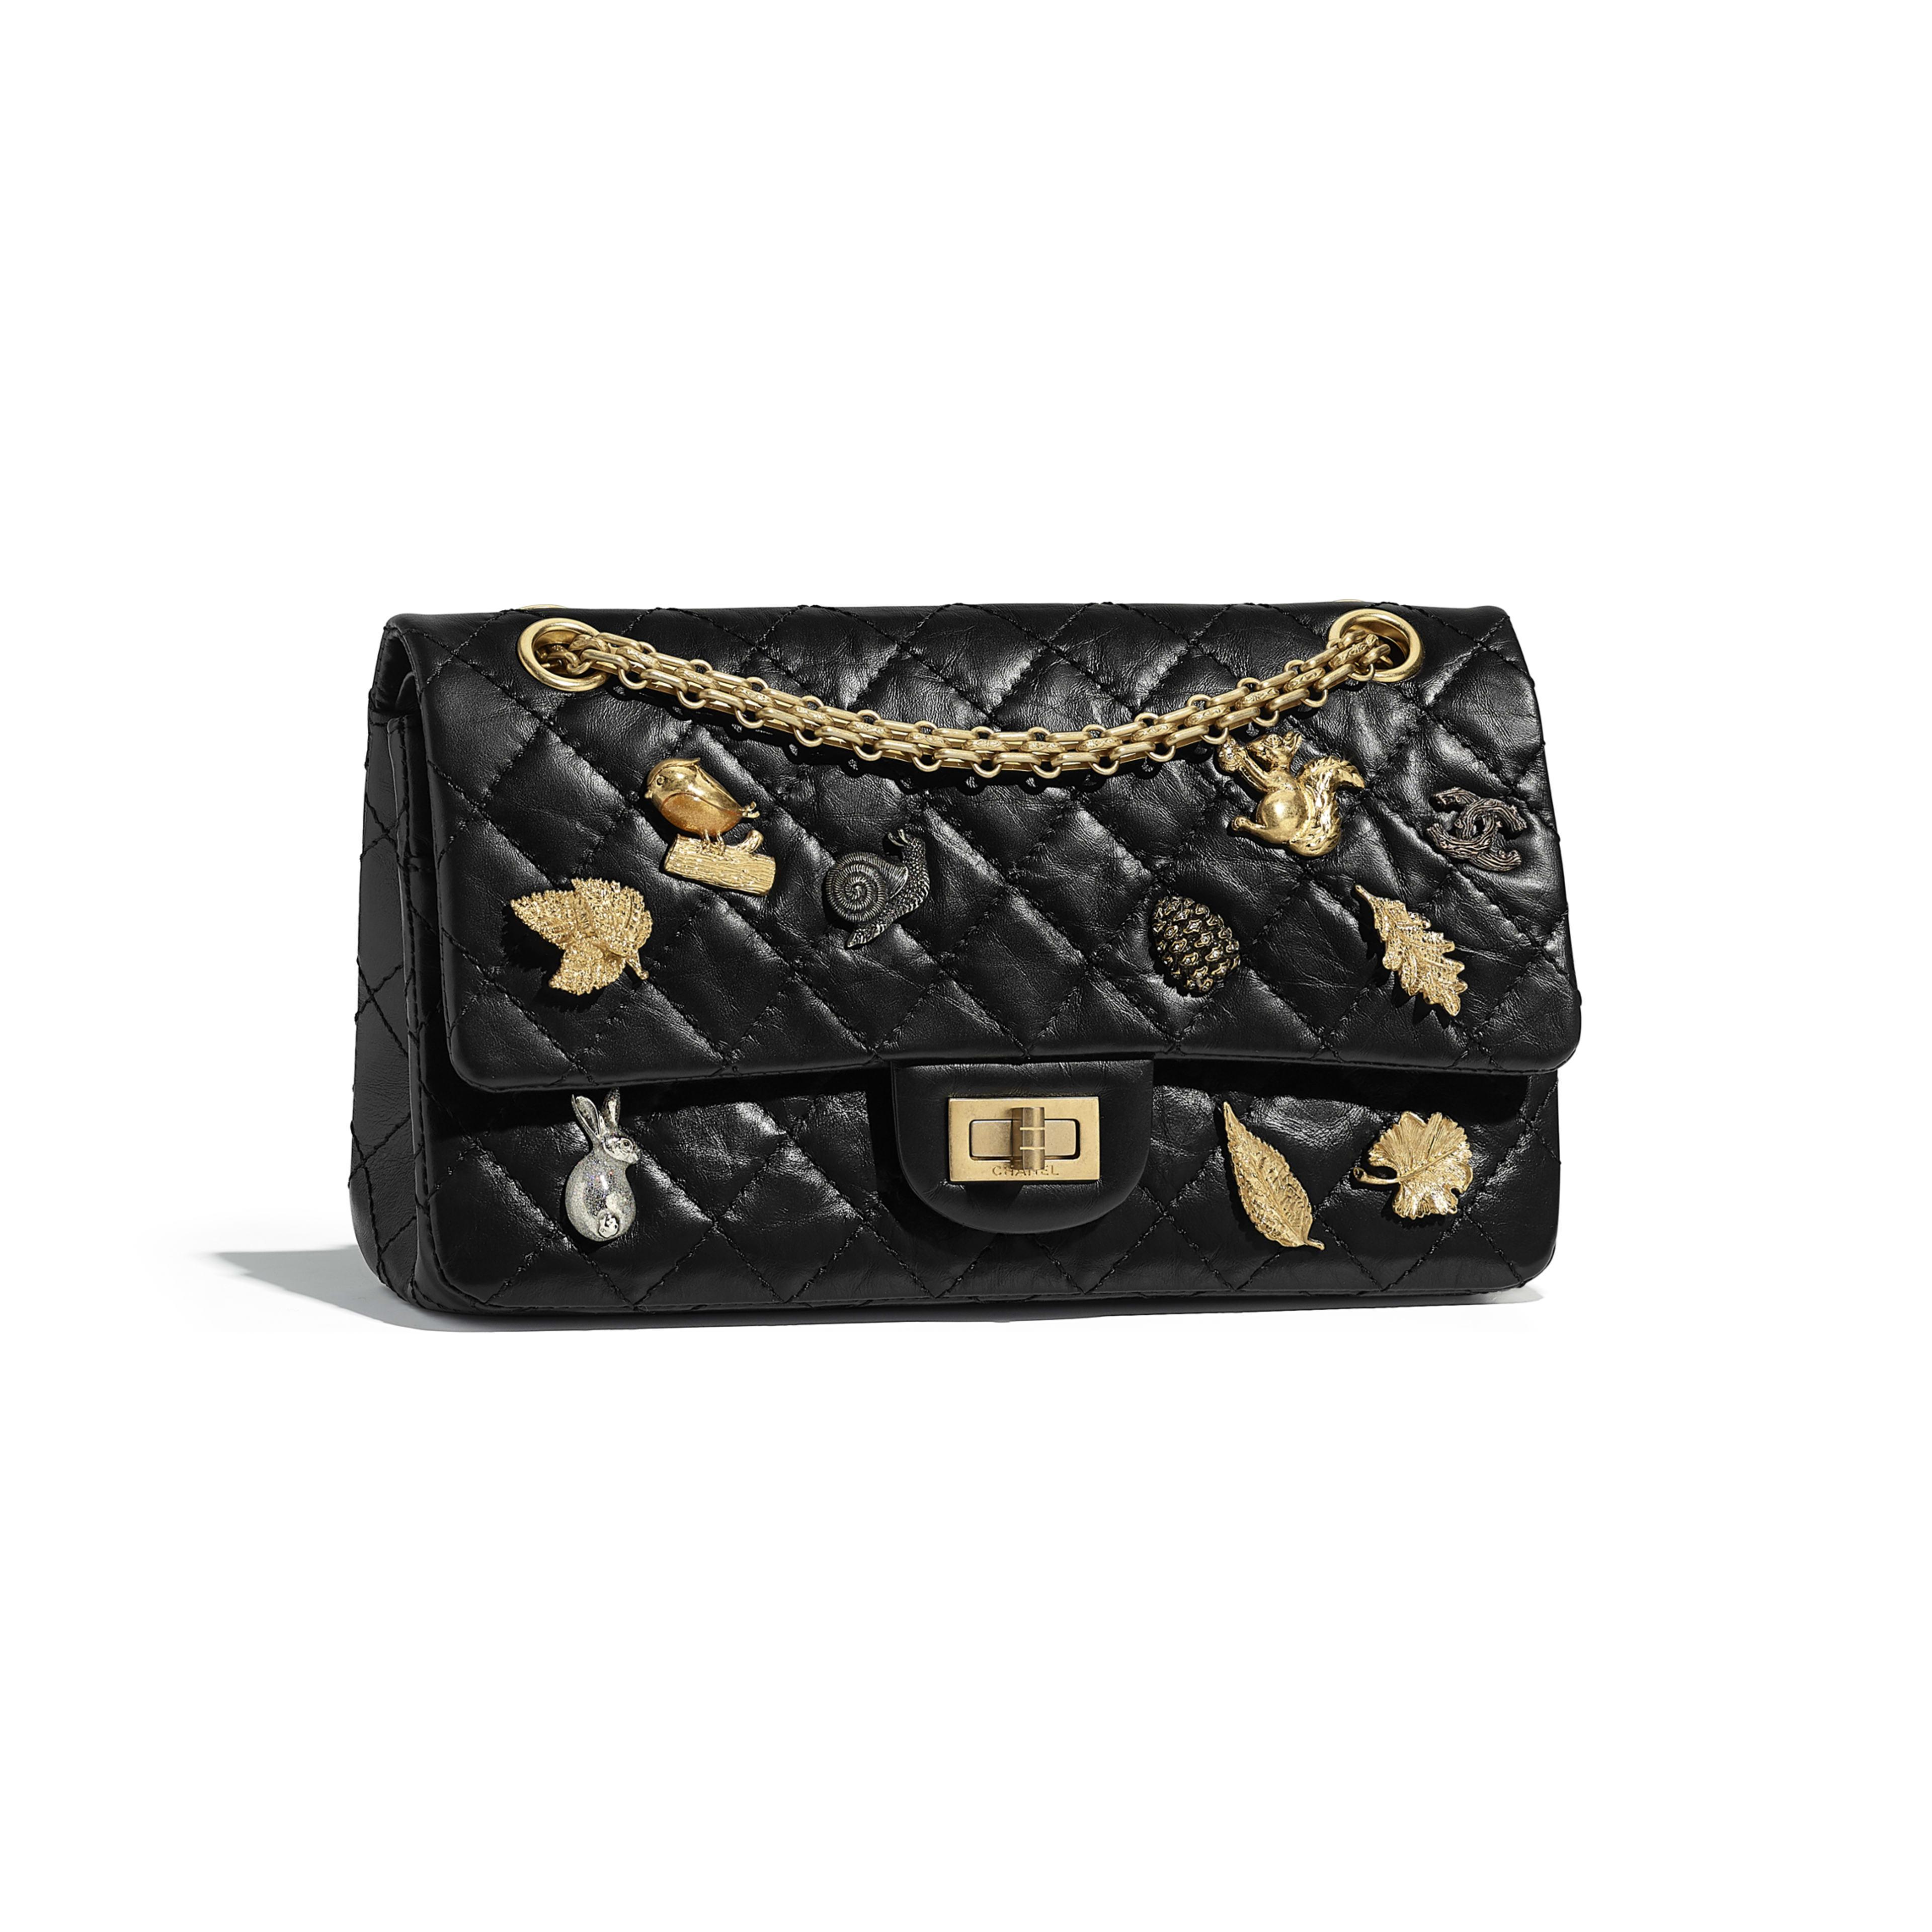 2.55 Handbag - Black - Aged Calfskin, Charms & Gold-Tone Metal - Default view - see full sized version